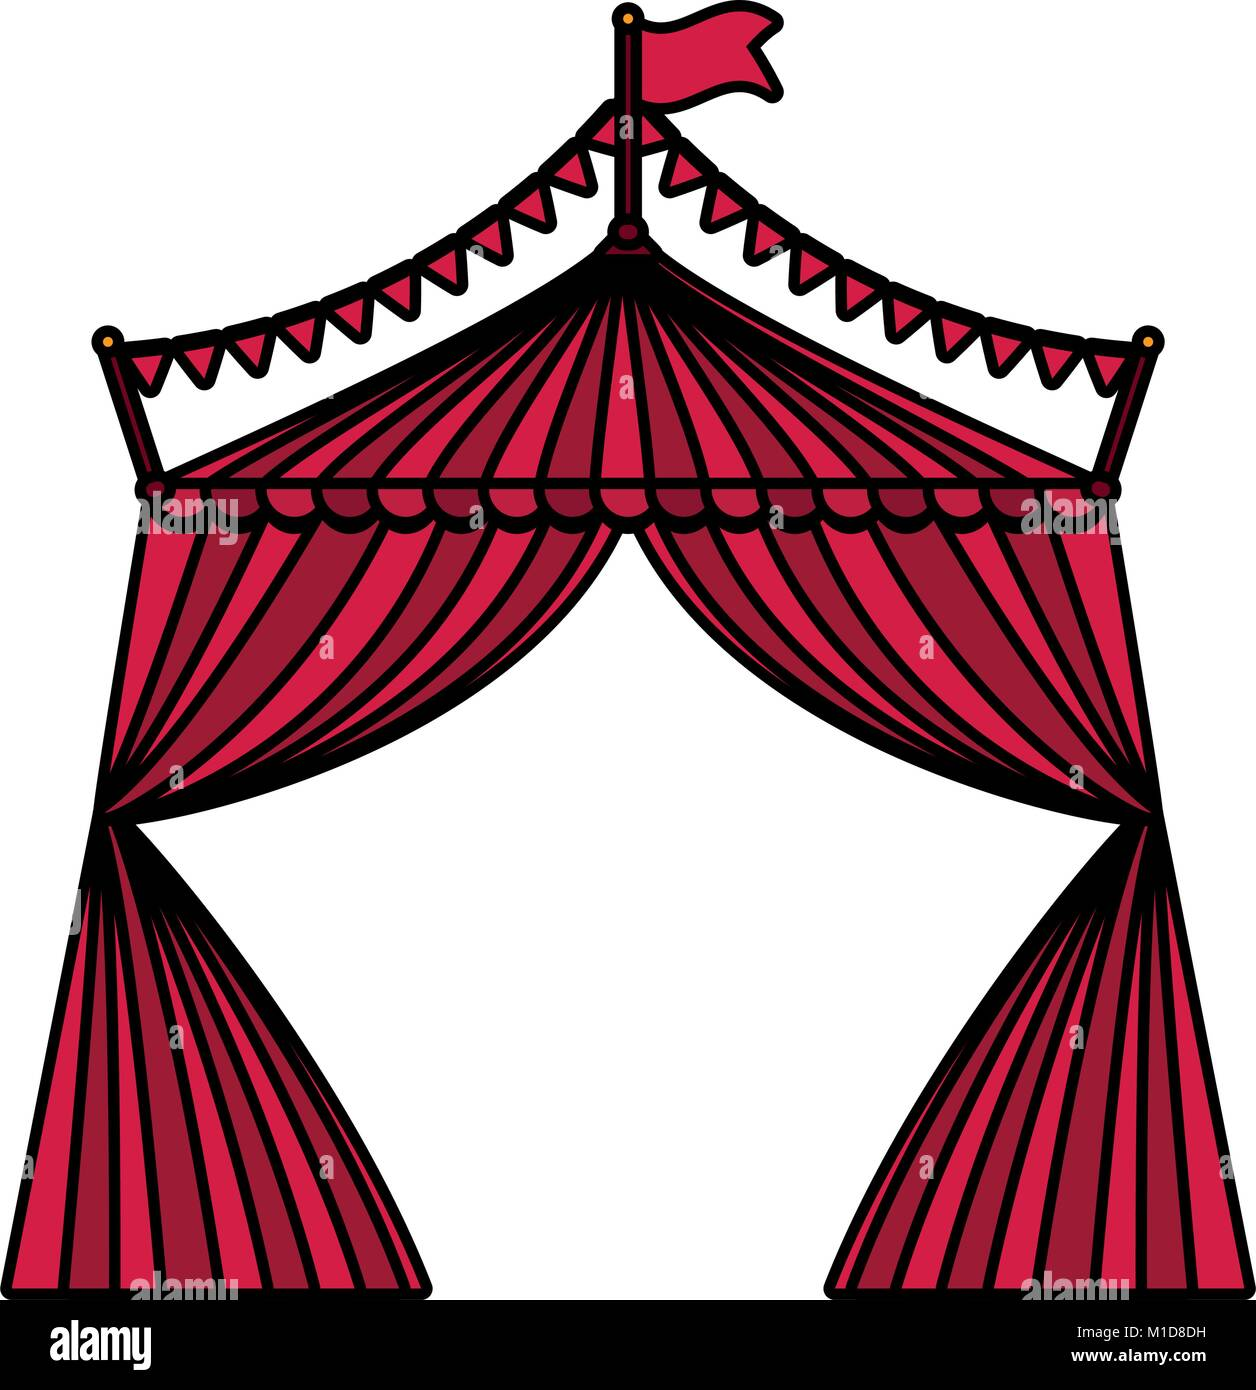 circus tent design  sc 1 st  Alamy & circus tent design Stock Vector Art u0026 Illustration Vector Image ...